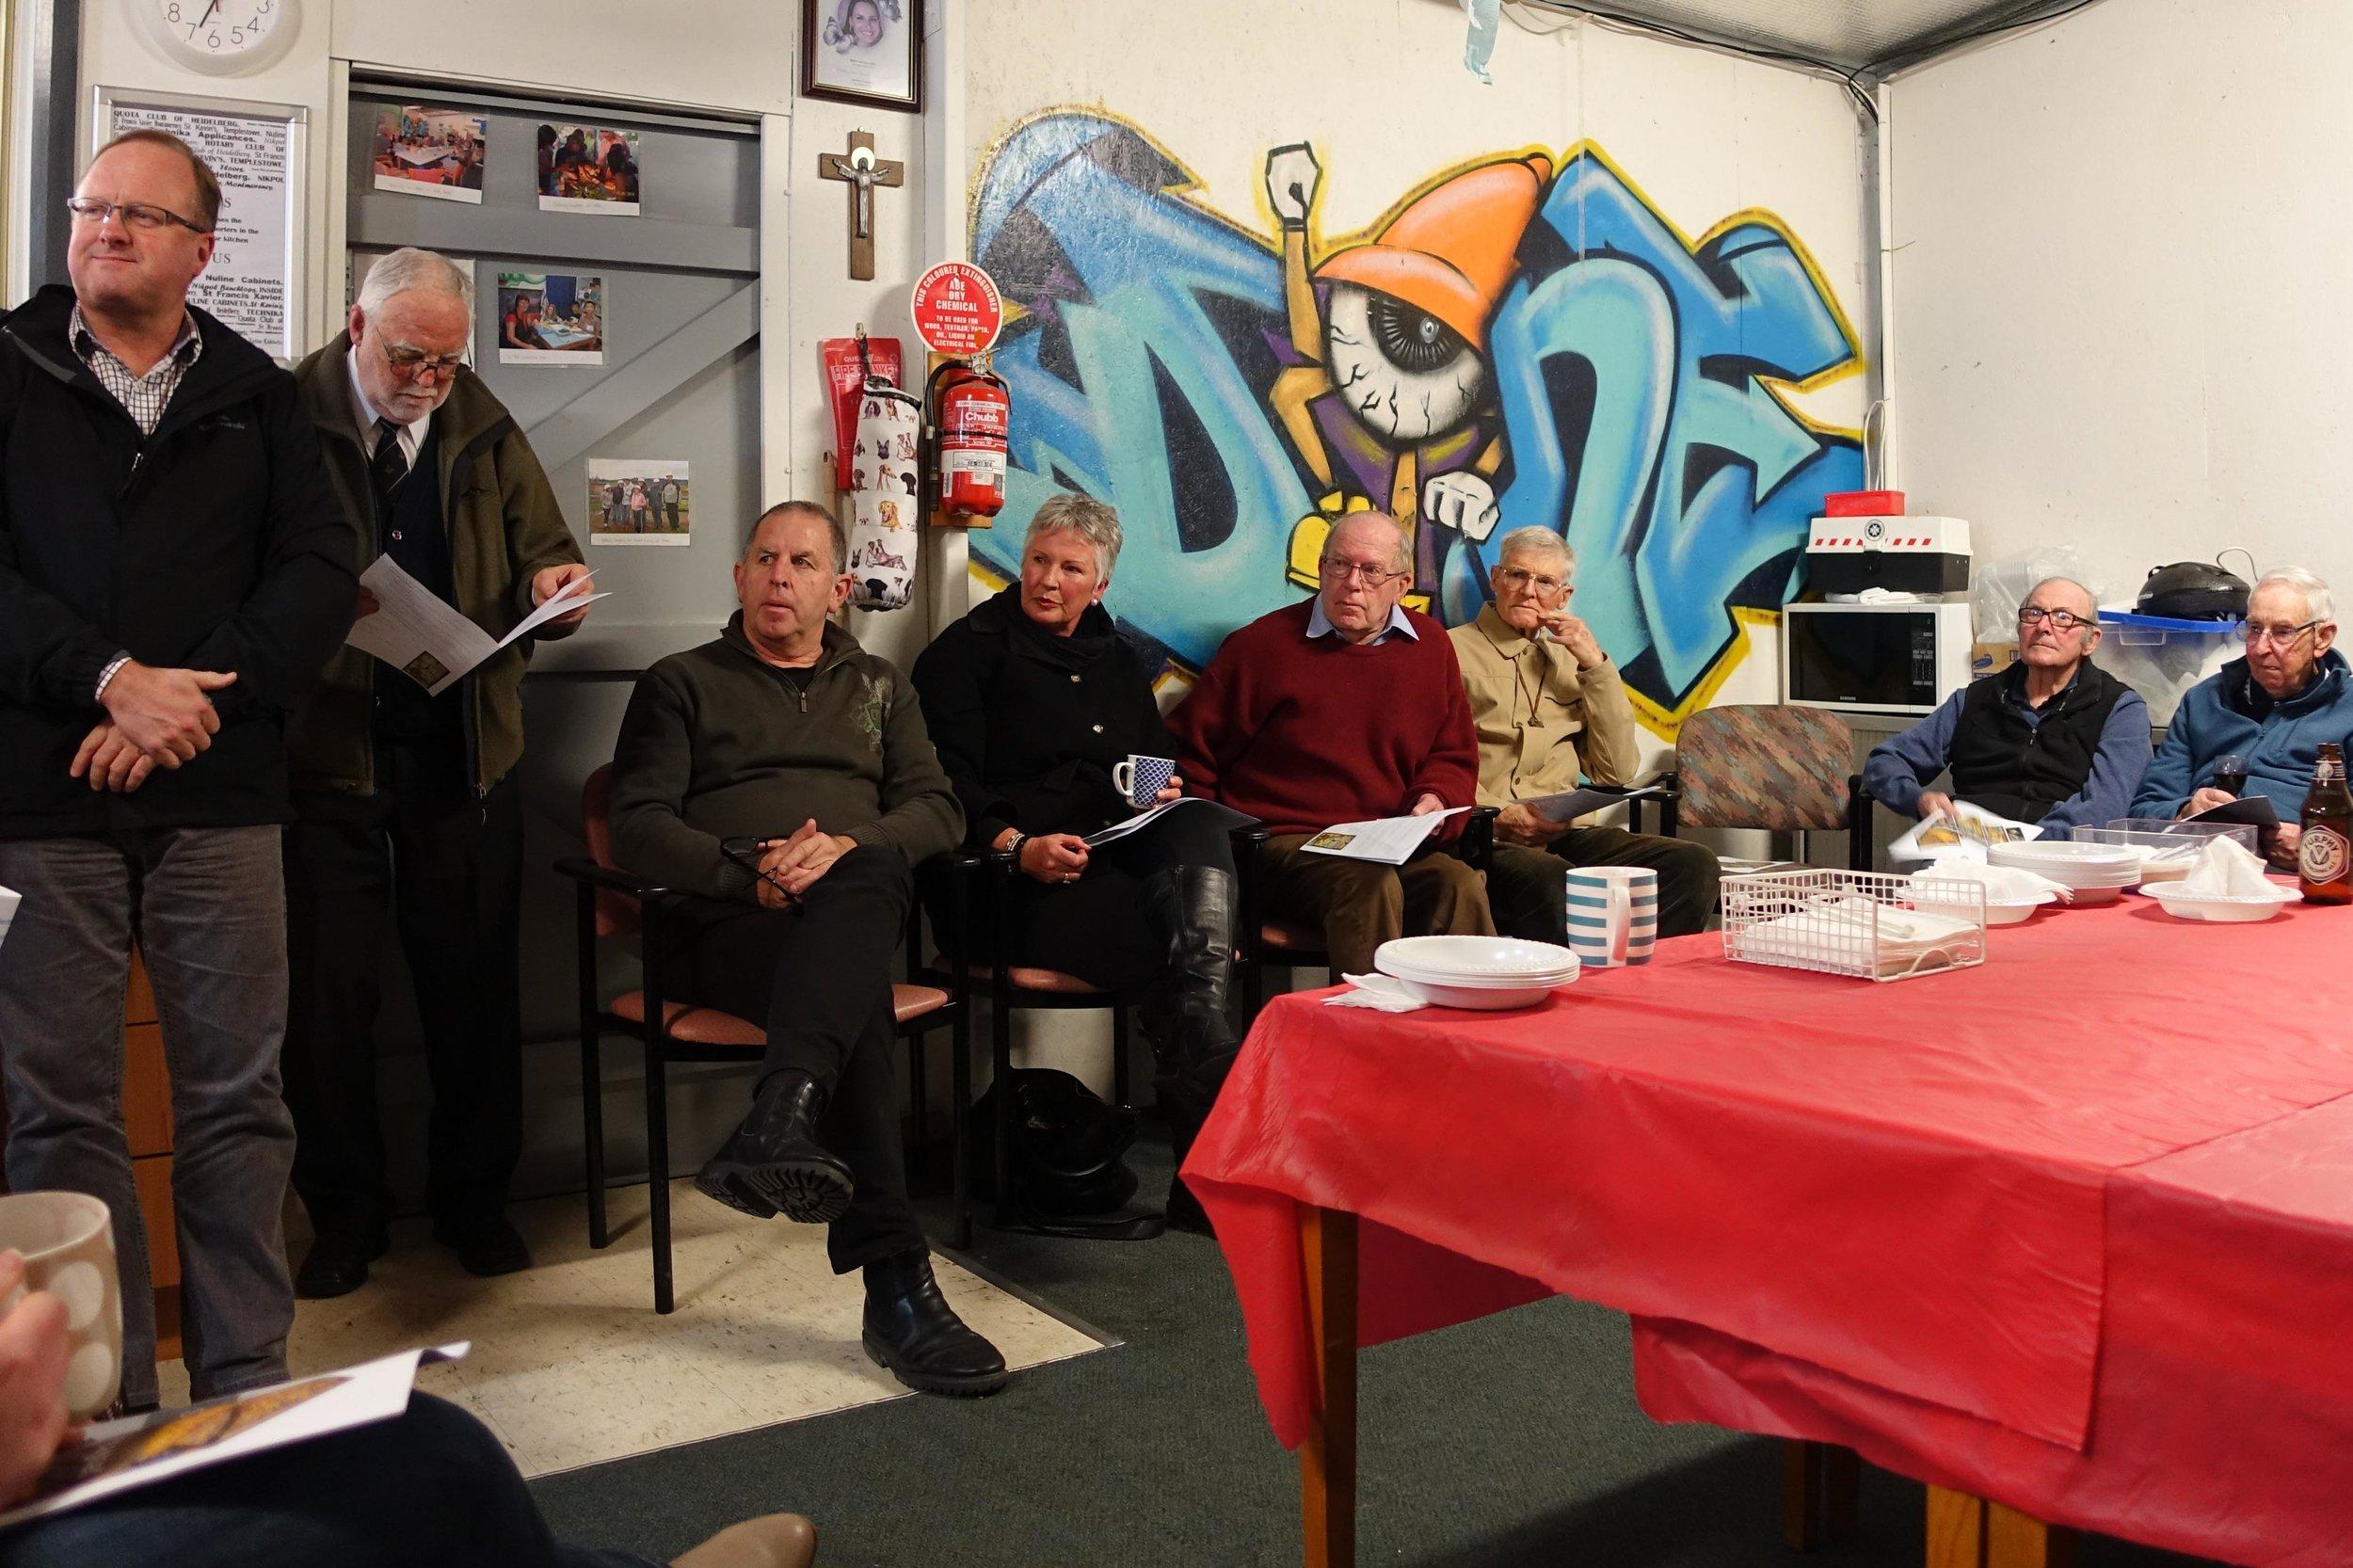 Melbourne Marists - Heidelberg West Gathering 2